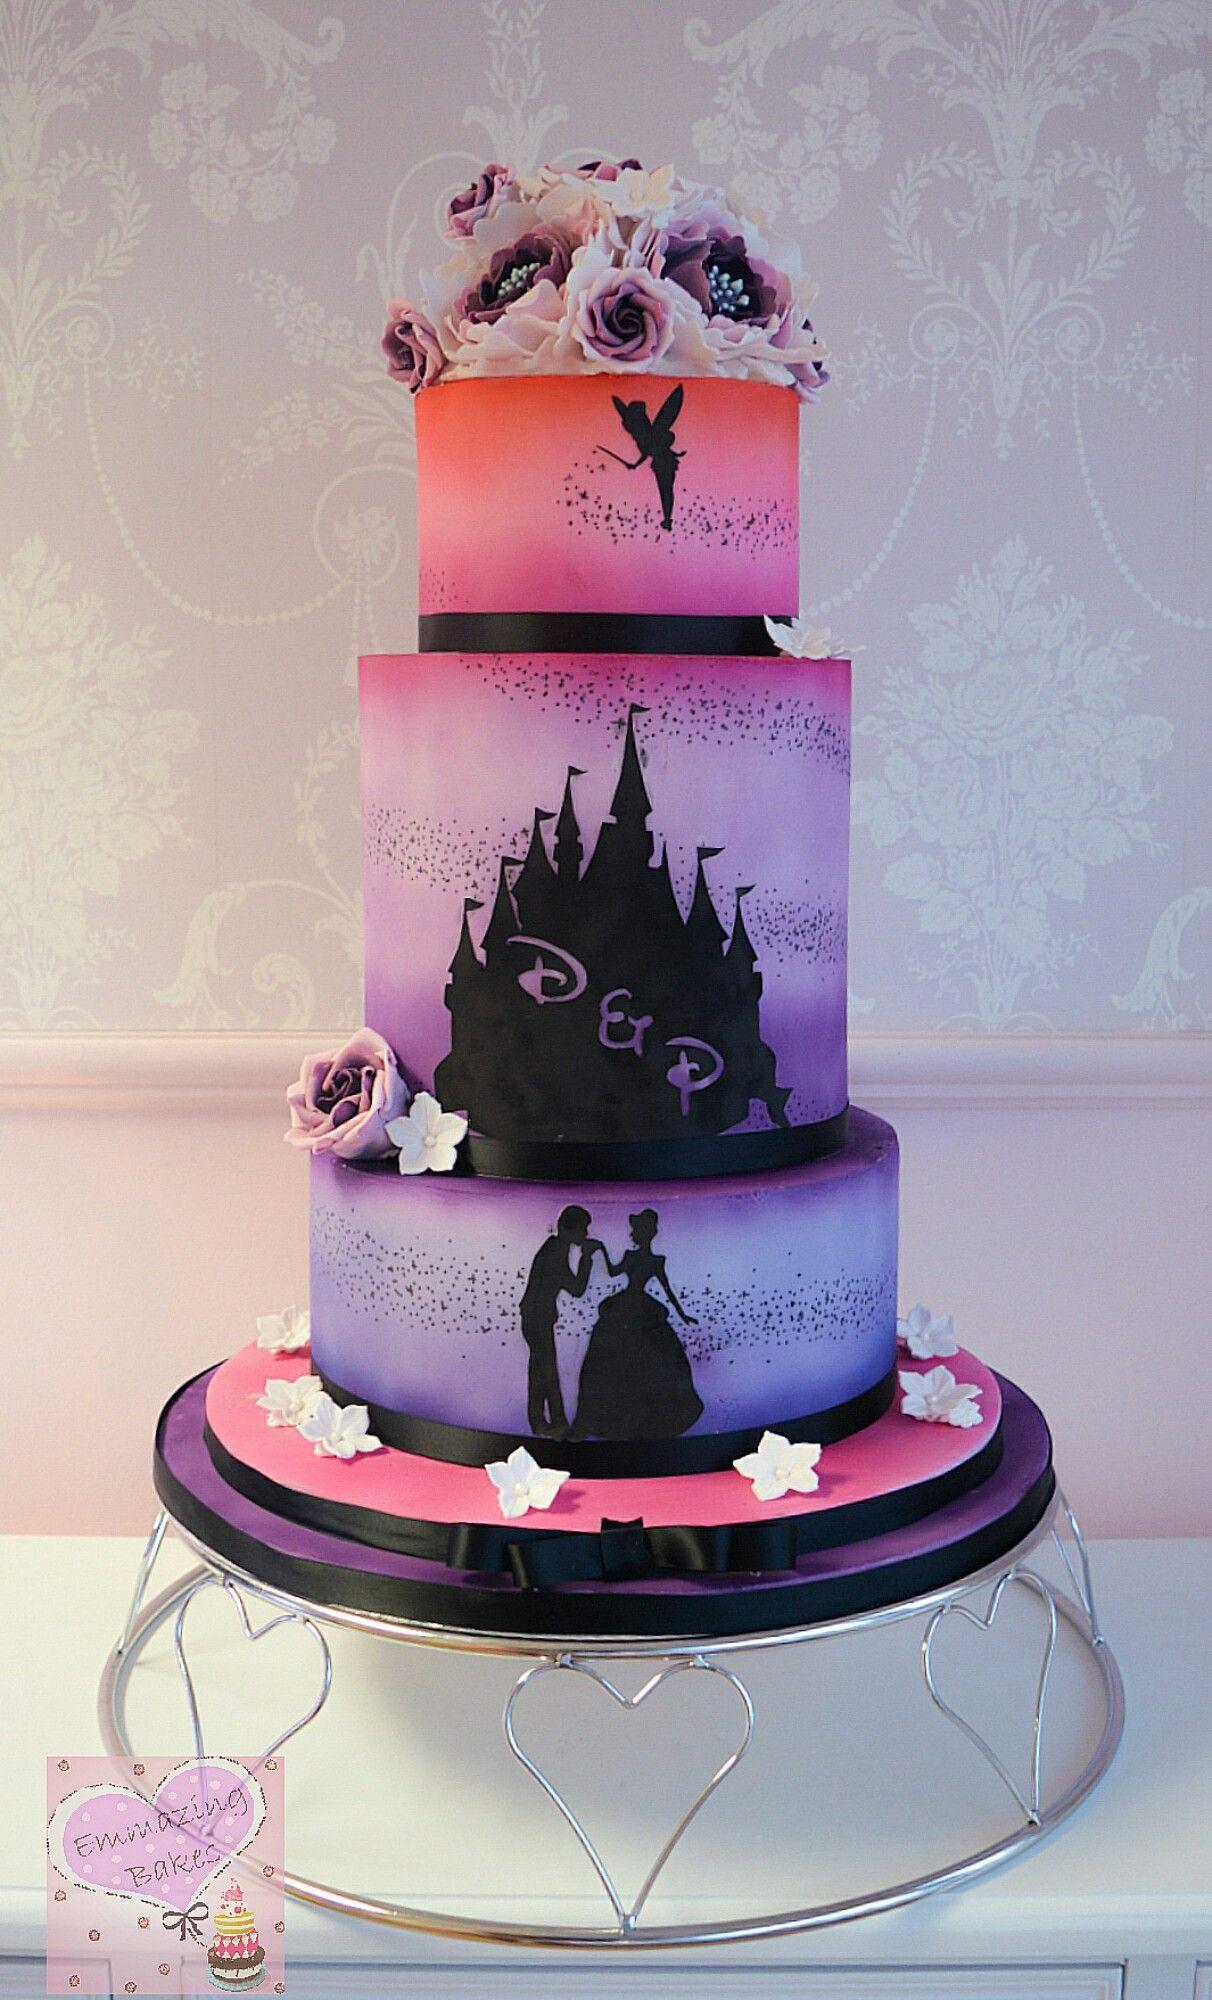 Disney Silhouette Wedding Cake Wedding Ideas Silhouette Wedding